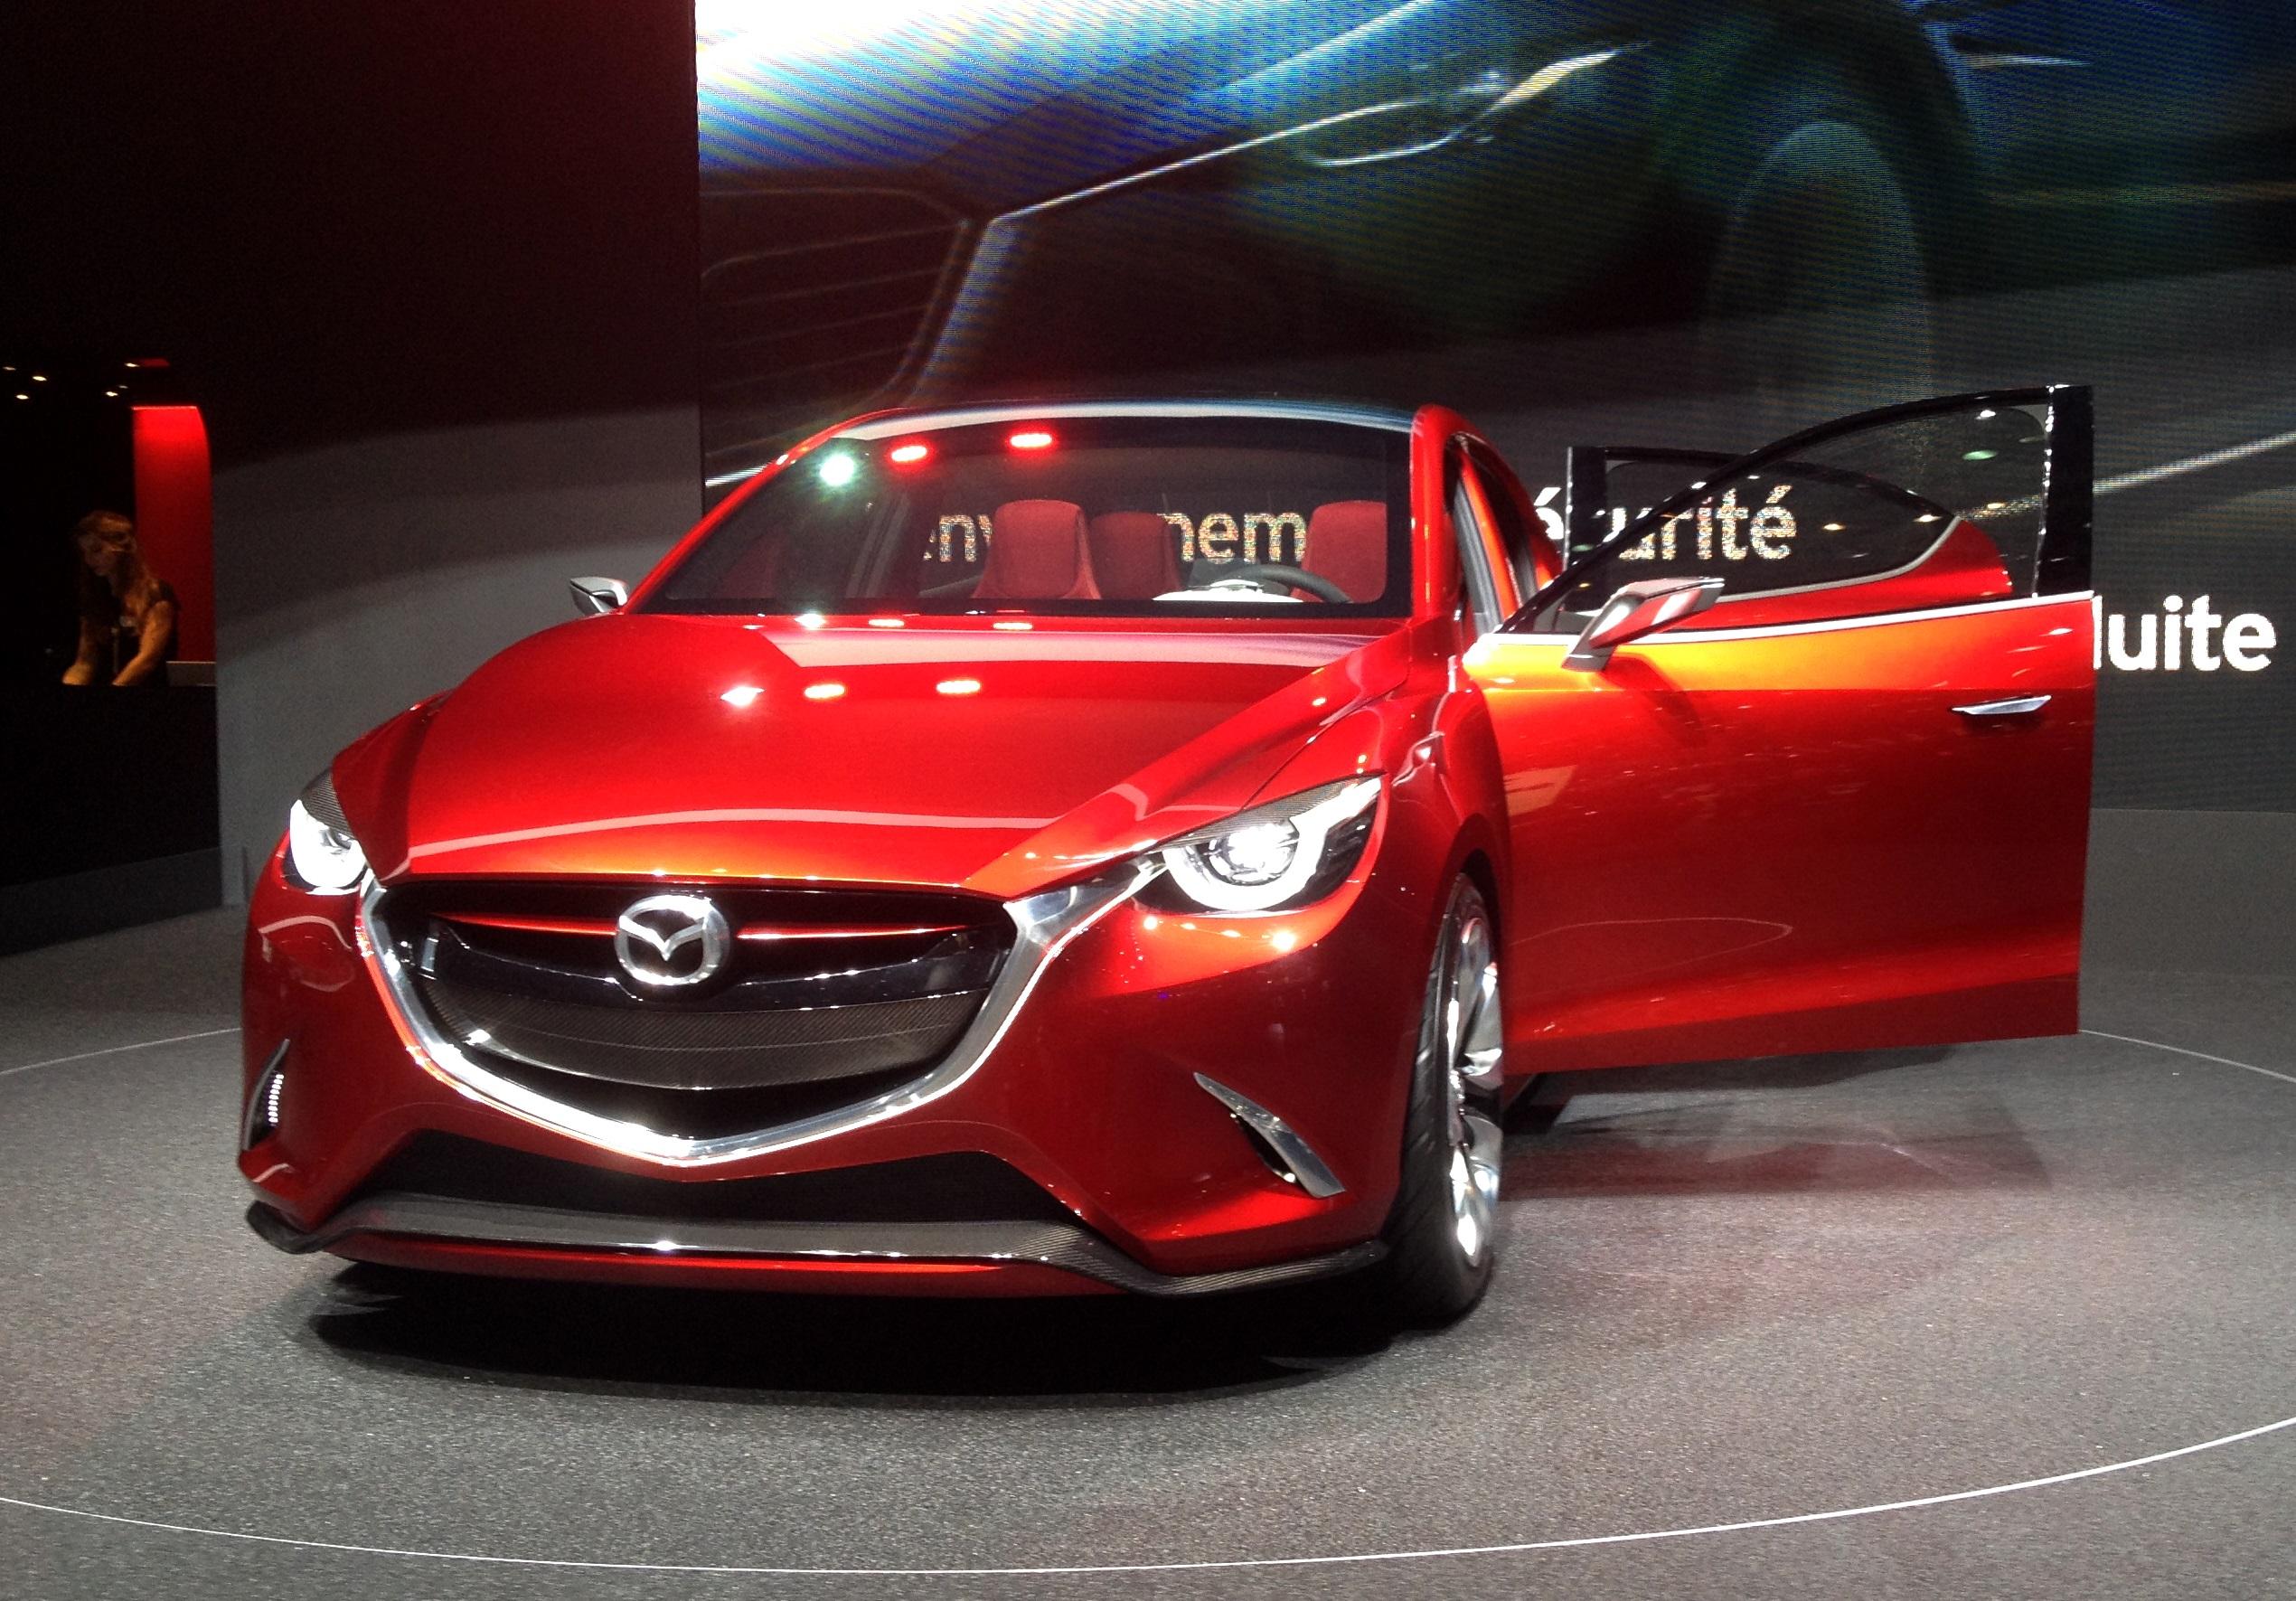 File:Mazda Hazumi Concept 02.JPG - Wikimedia Commons